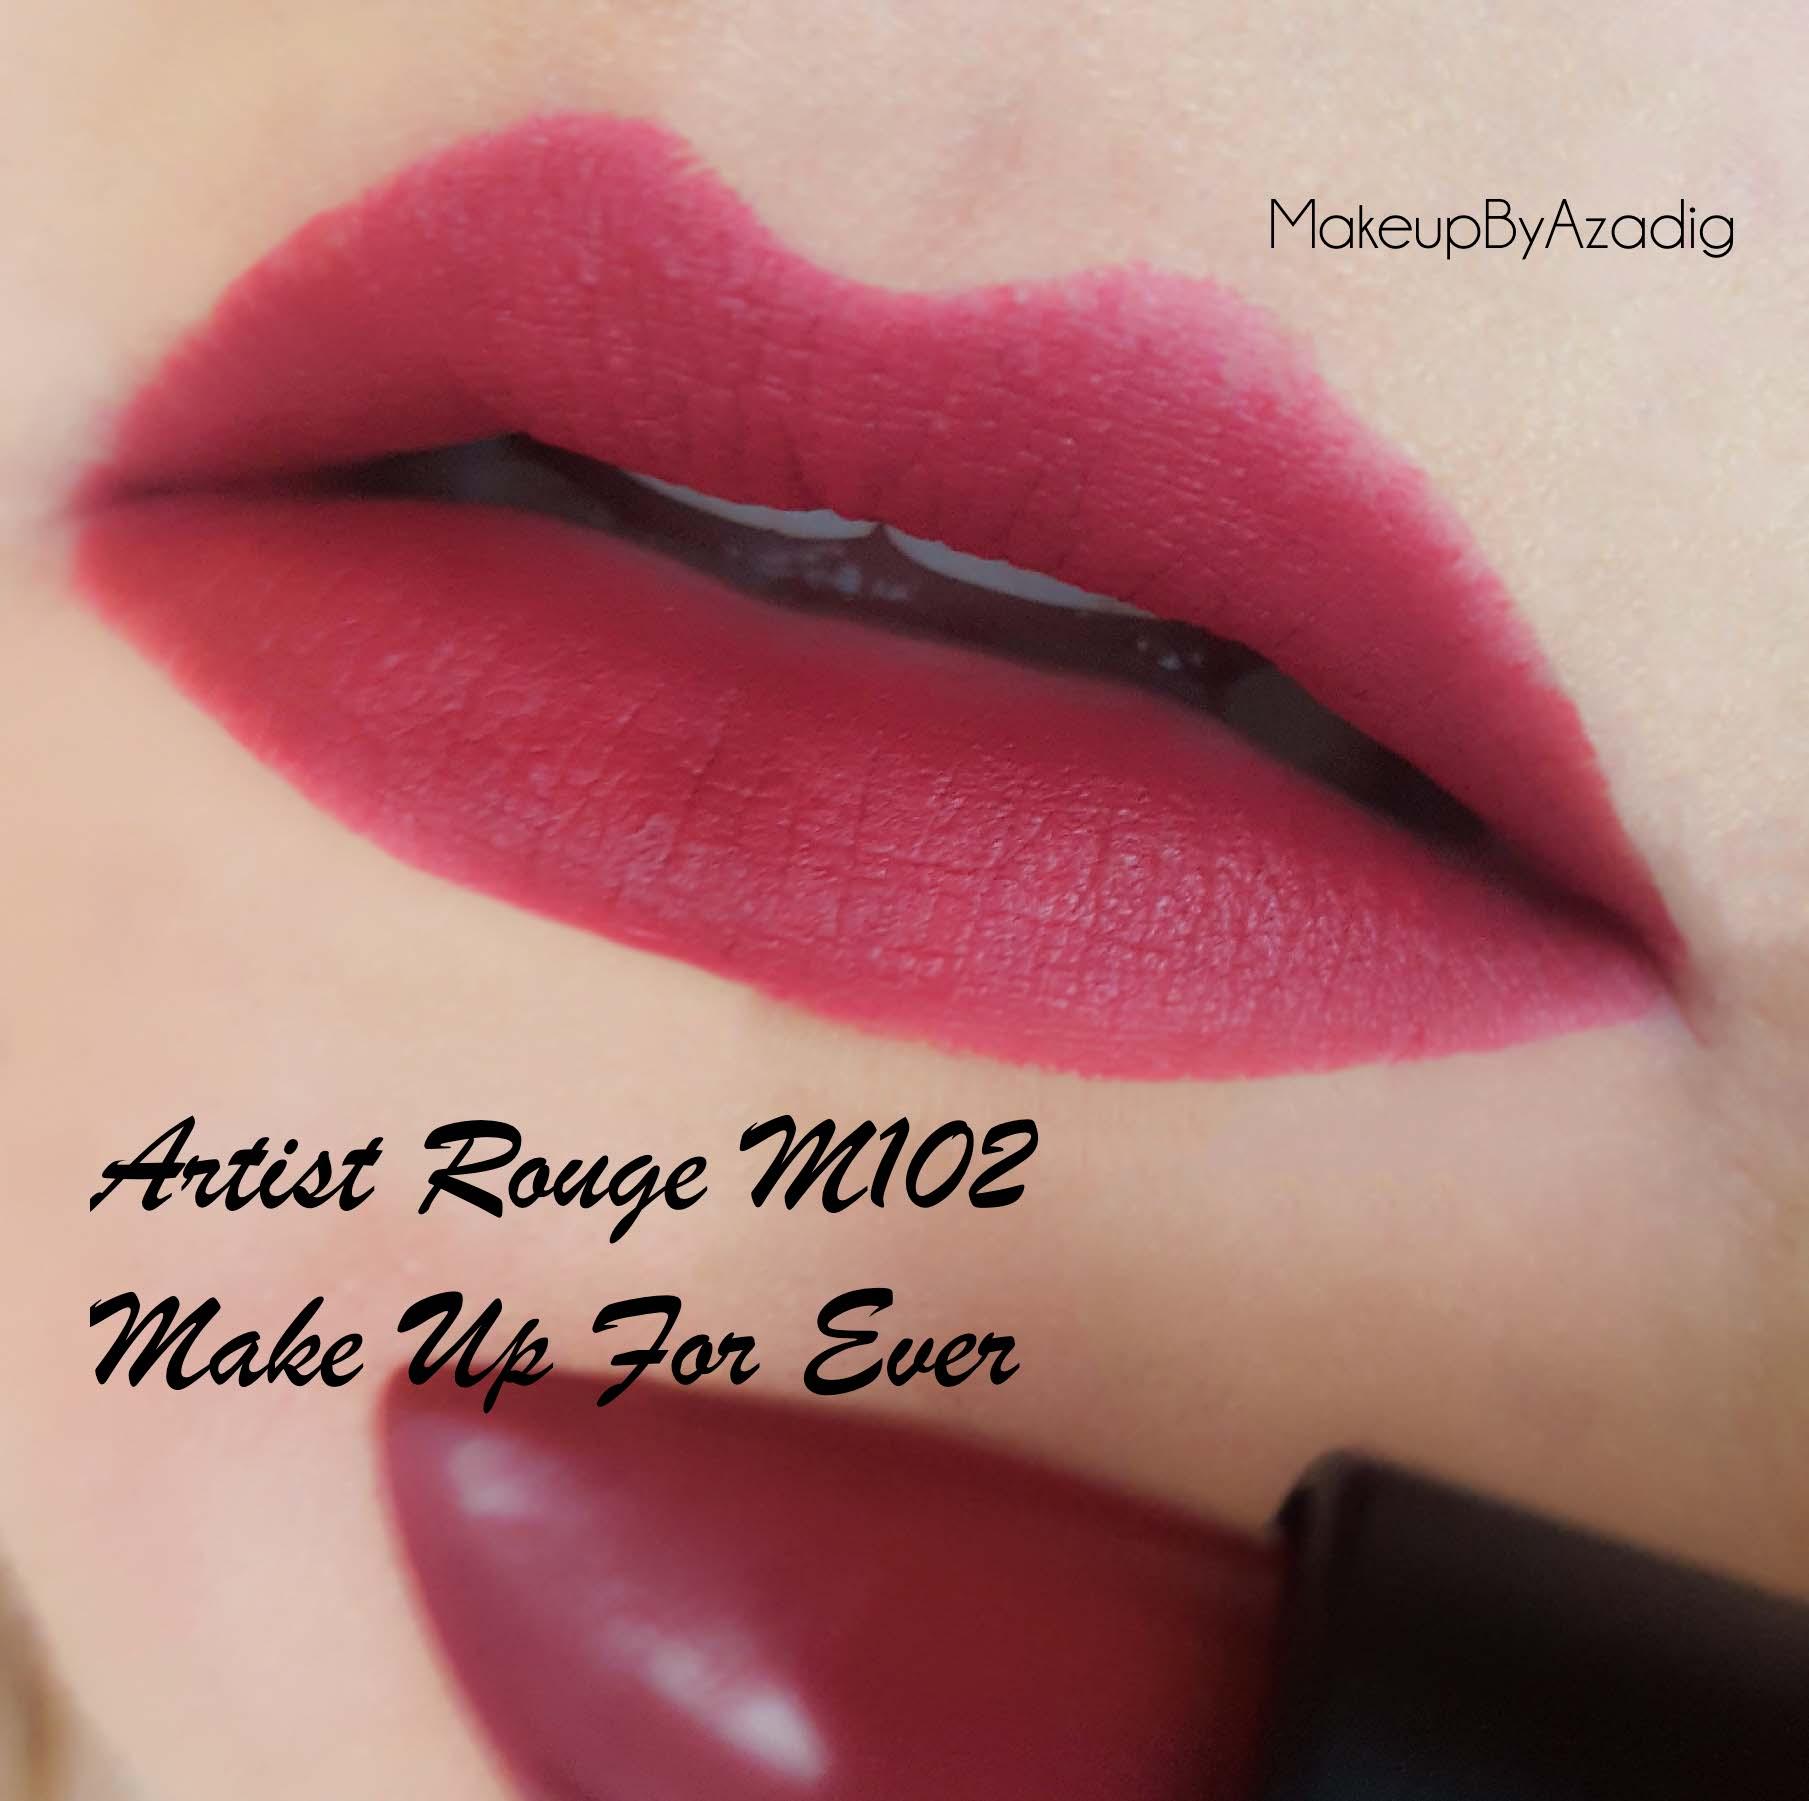 revue-artist-rouge-makeup-for-ever-rouge-levres-mat-sephora-prix-avis-review-m102-makeupbyazadig-swatch